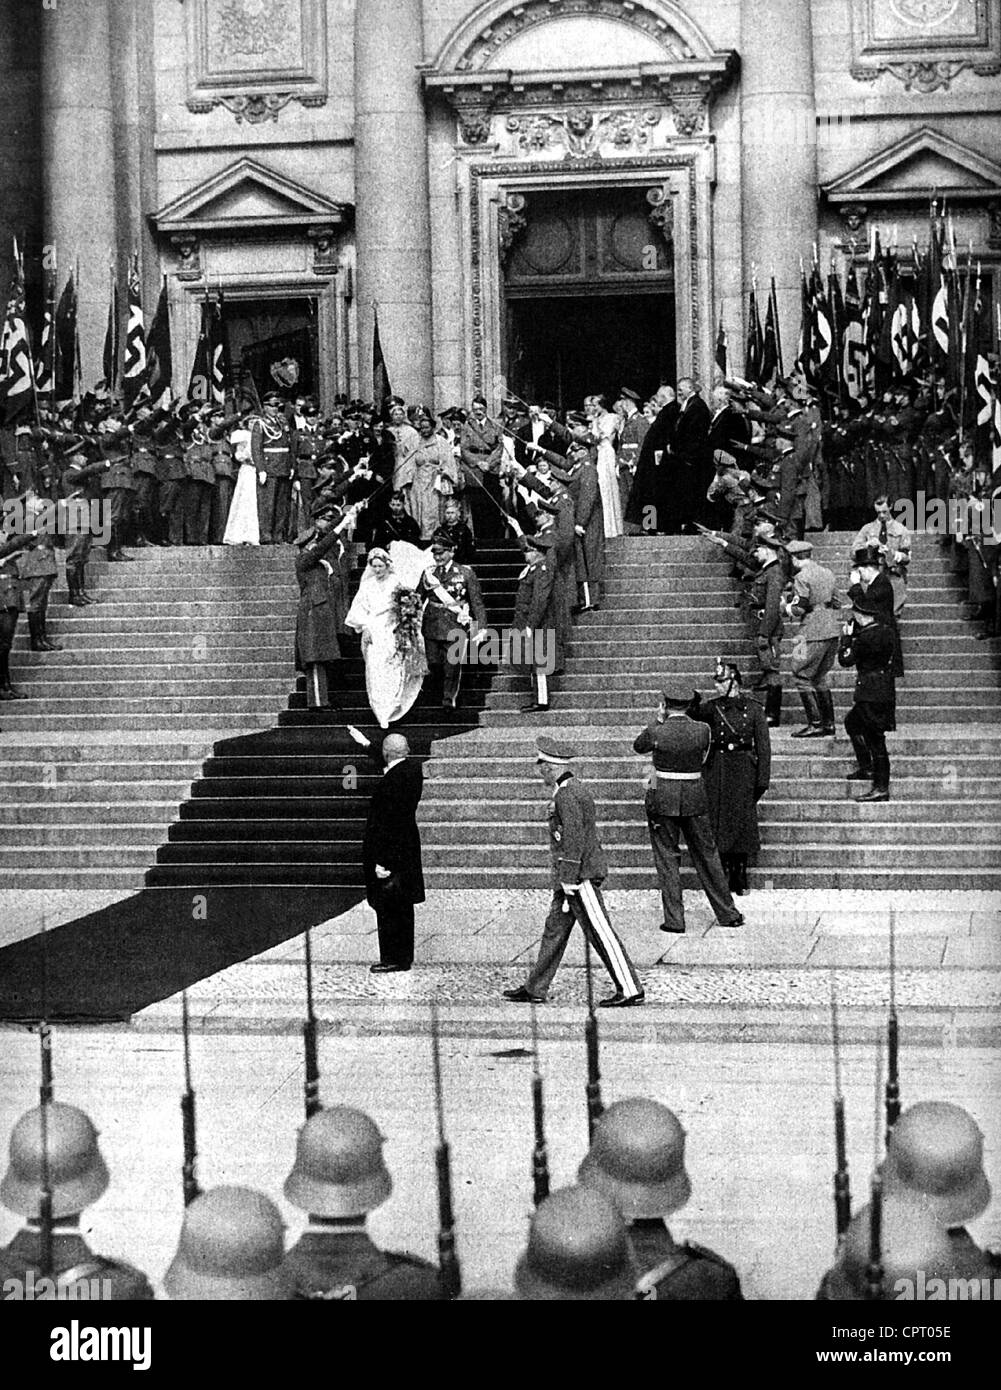 Goering, Hermann, 12.1.1893 - 15.10.1946, Nazi politician, Reich Marshall, scene, his wedding with Emmy Sonnemann, - Stock Image